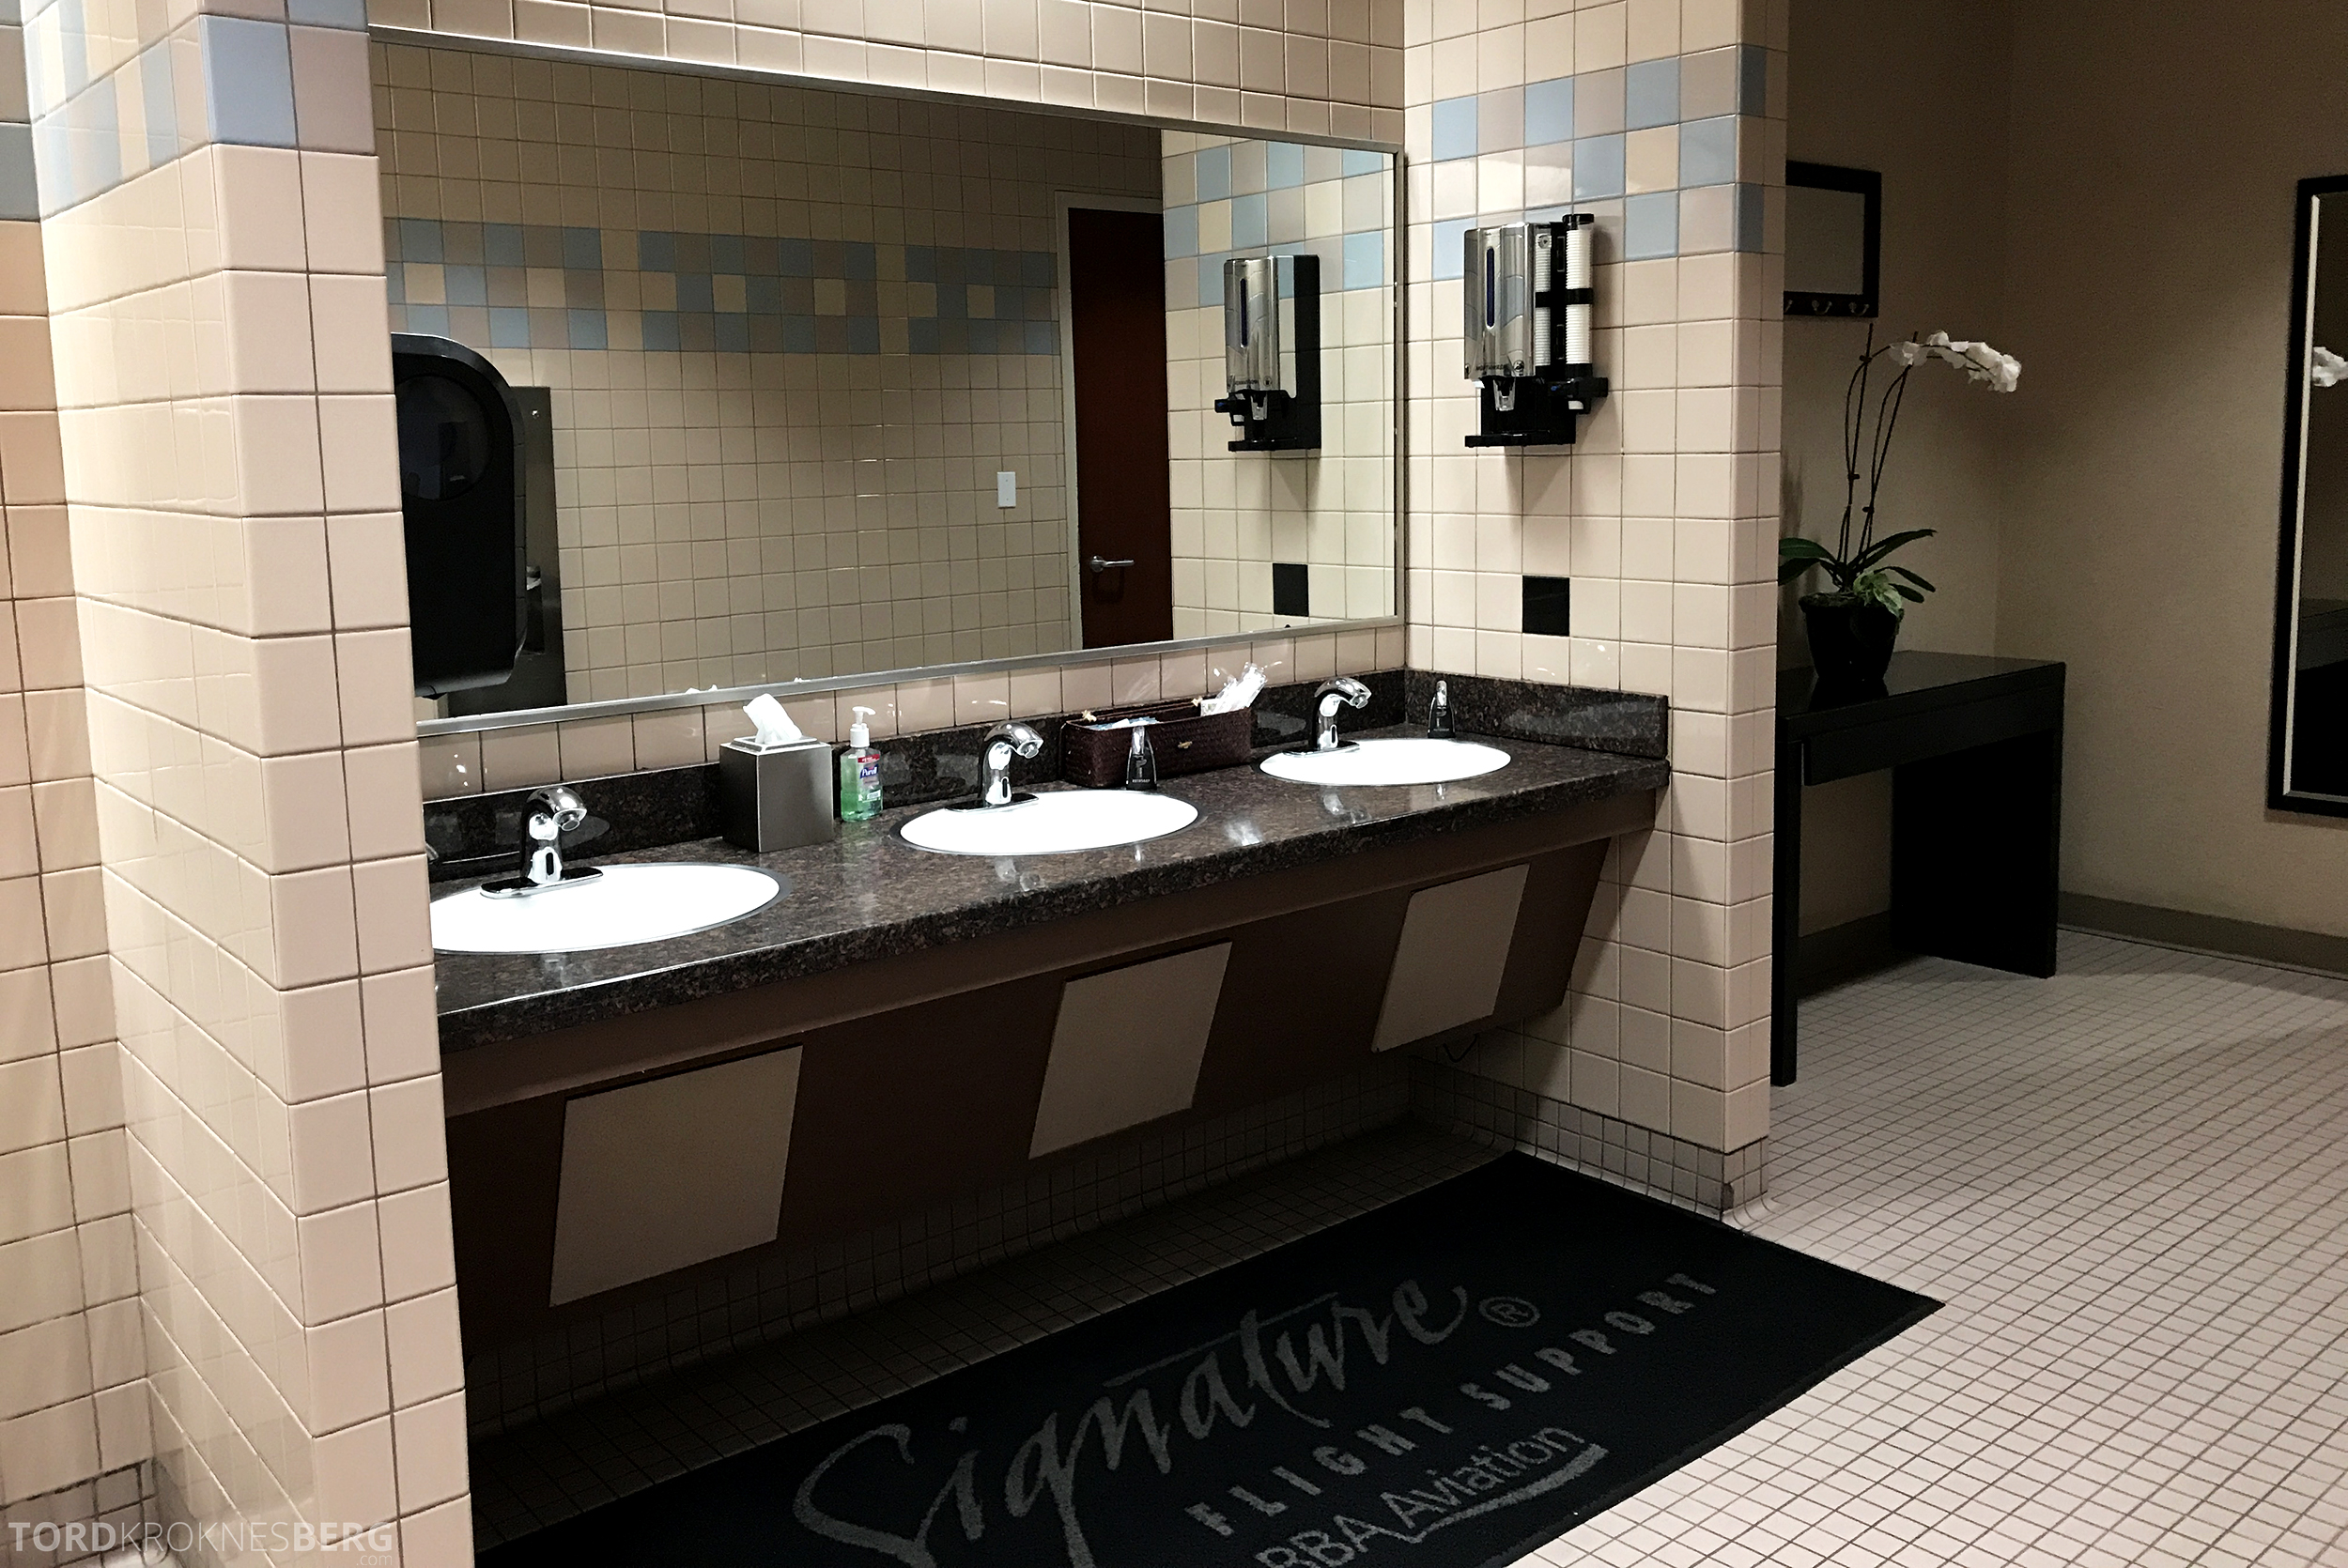 San Francisco Helicopter Tour Executive Terminal toalett